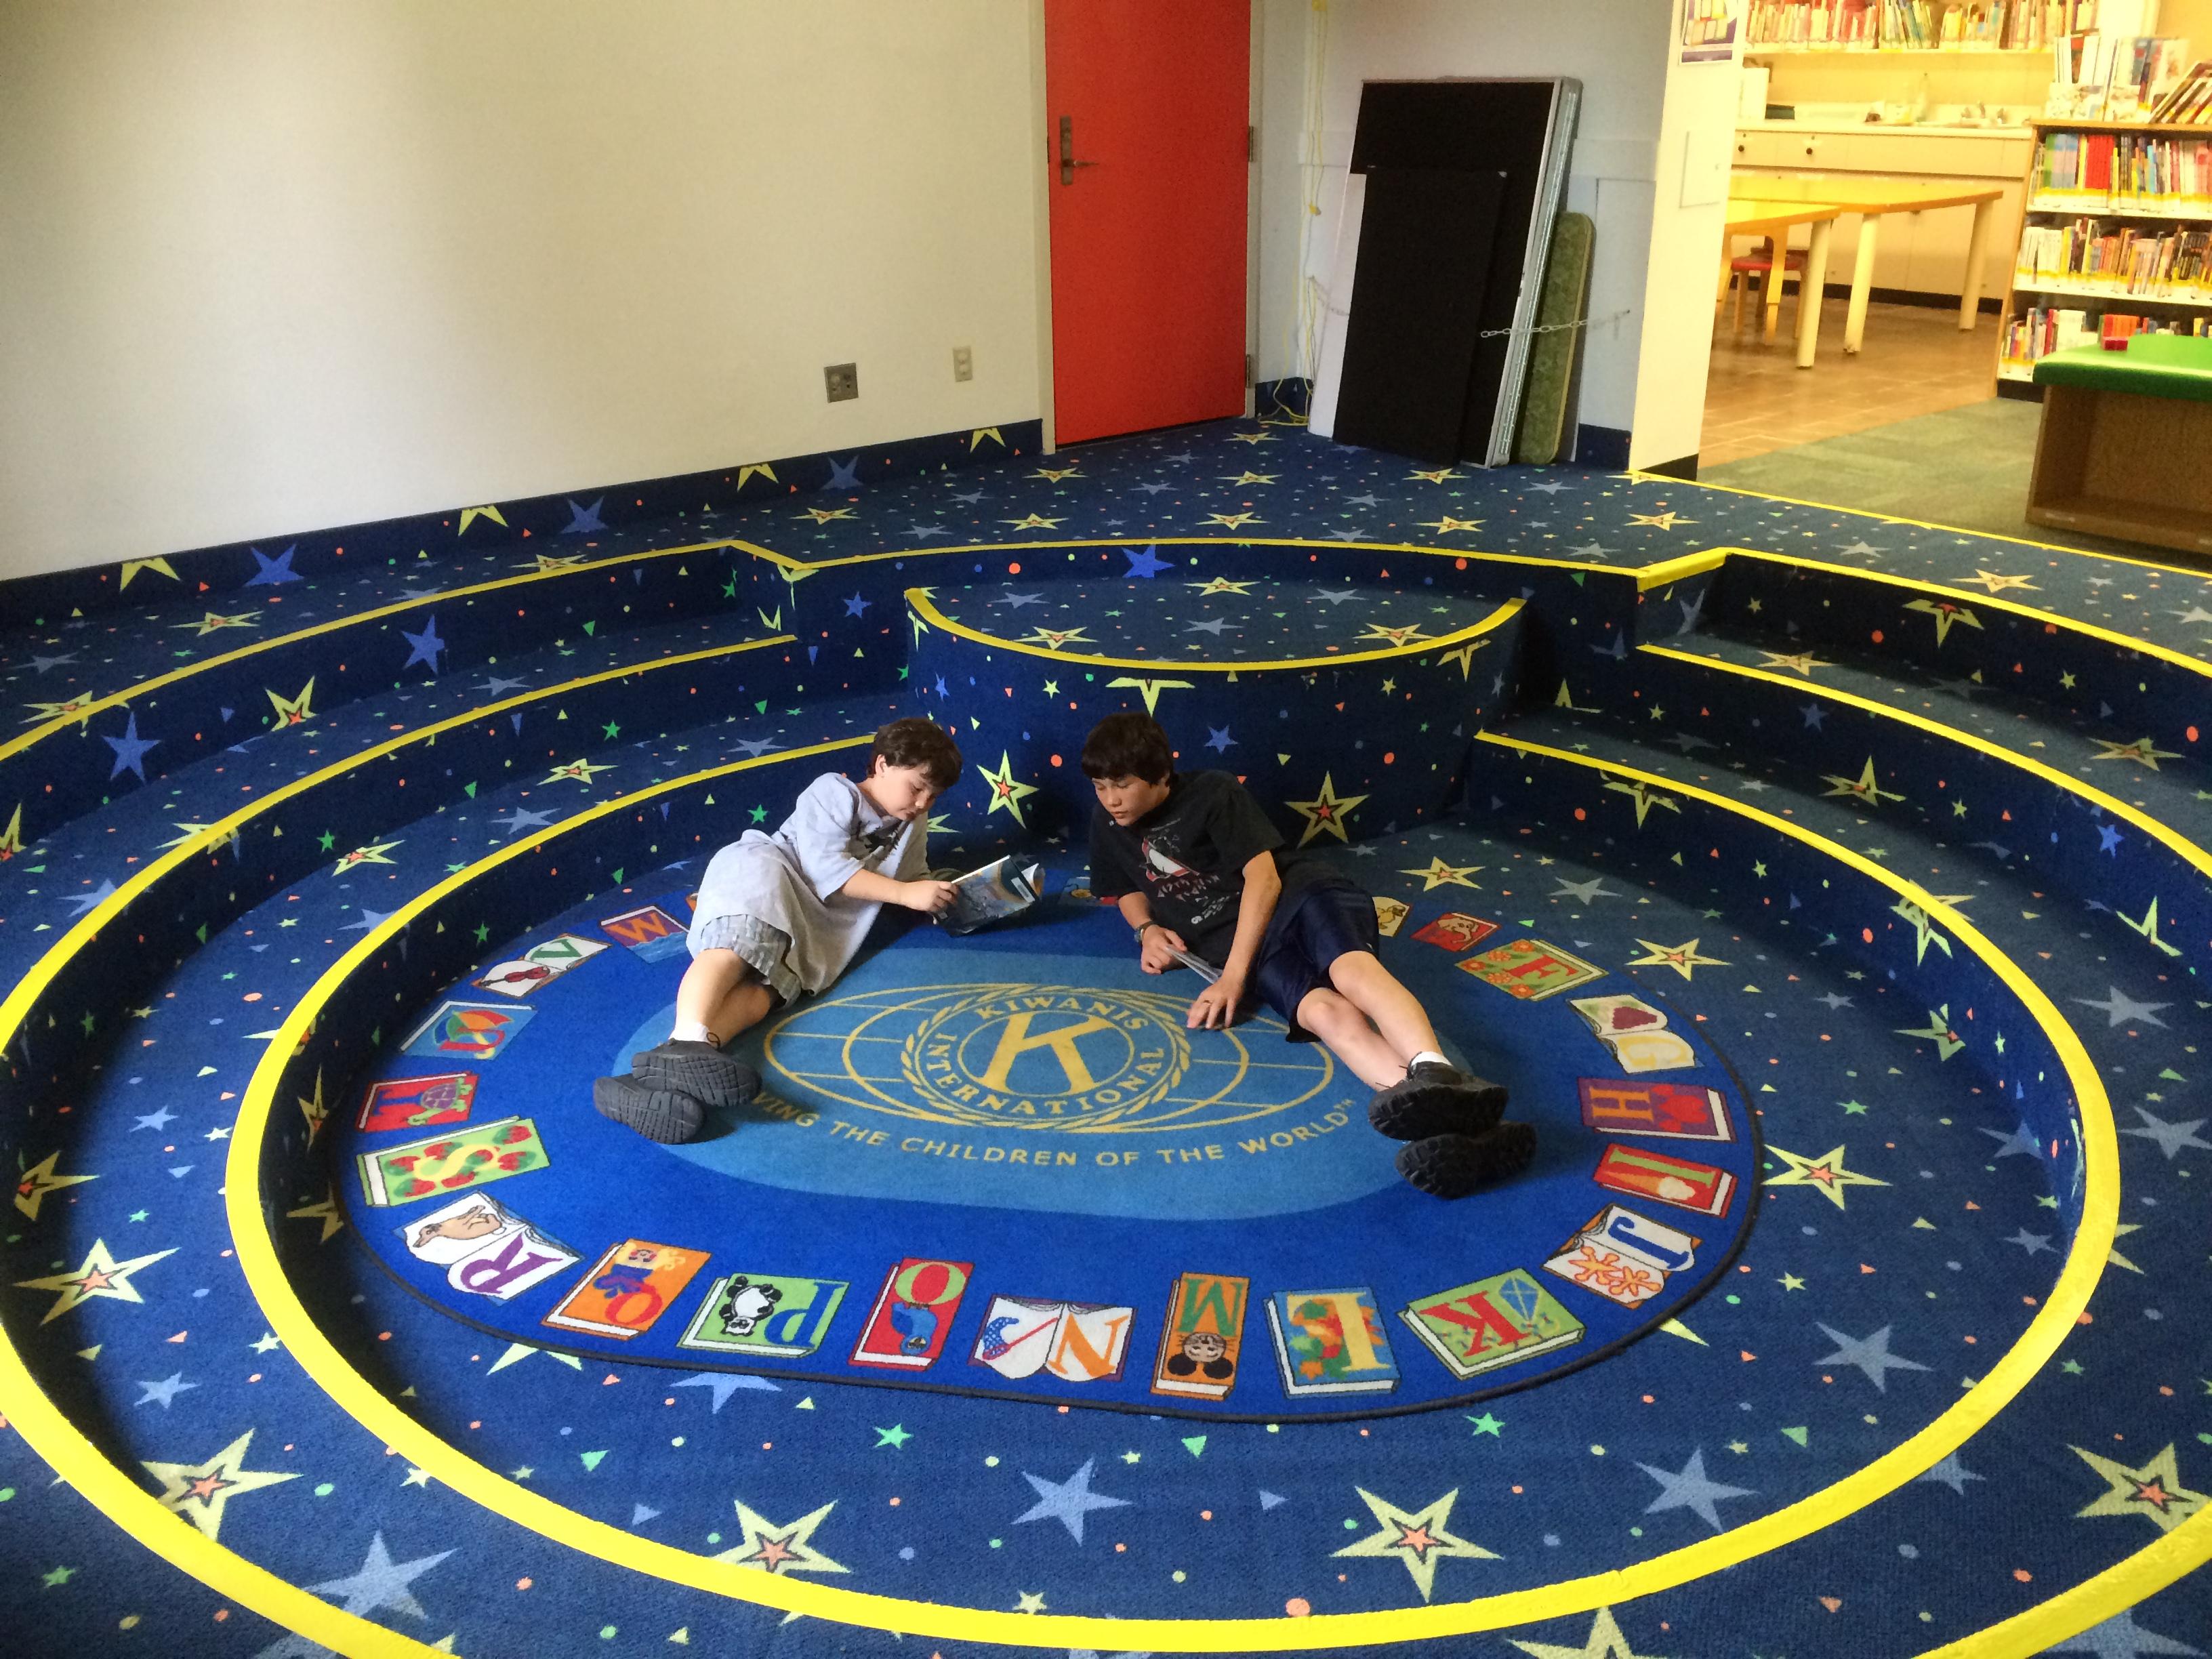 Niagara_Falls_Library_Kiwanis_Rug_with_Kids.jpeg